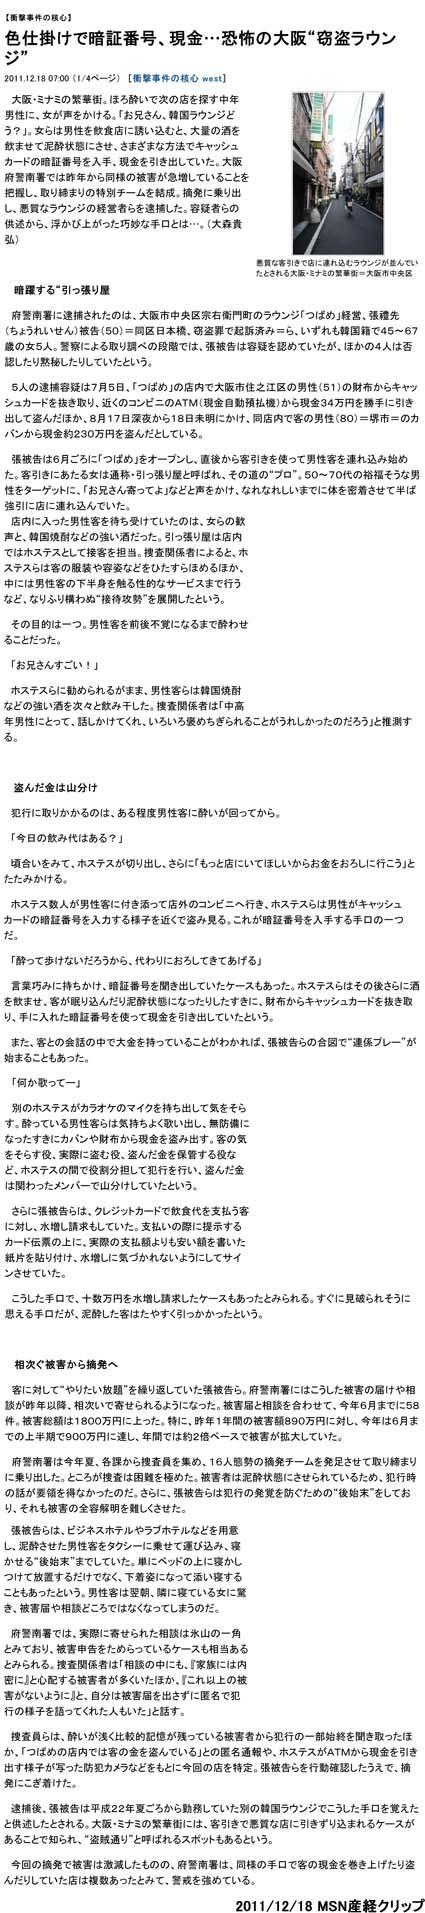 2011/12/18 MSN産経より